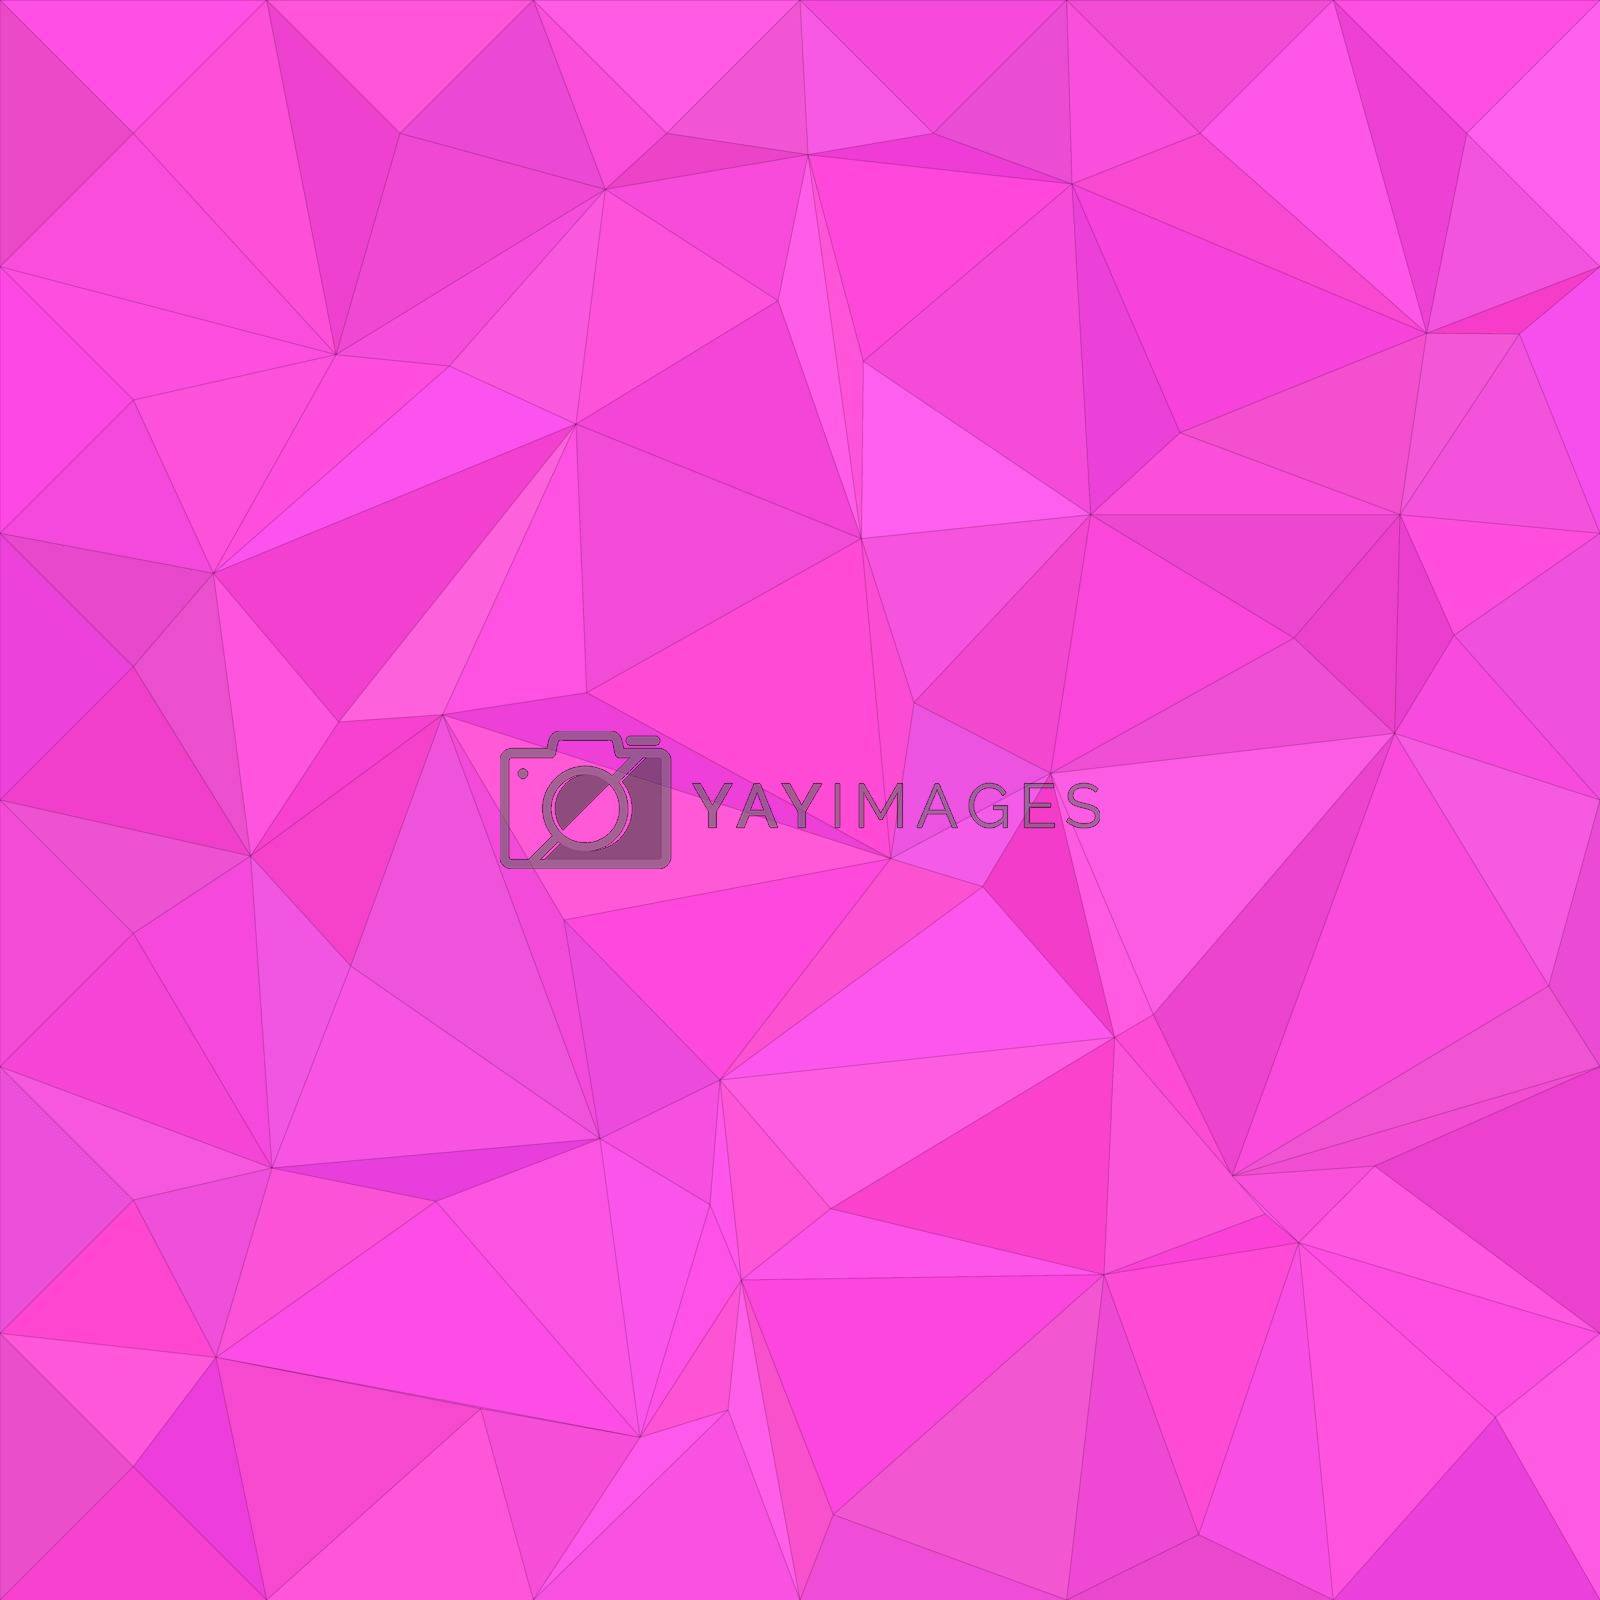 Magenta irregular triangle mosaic vector background design